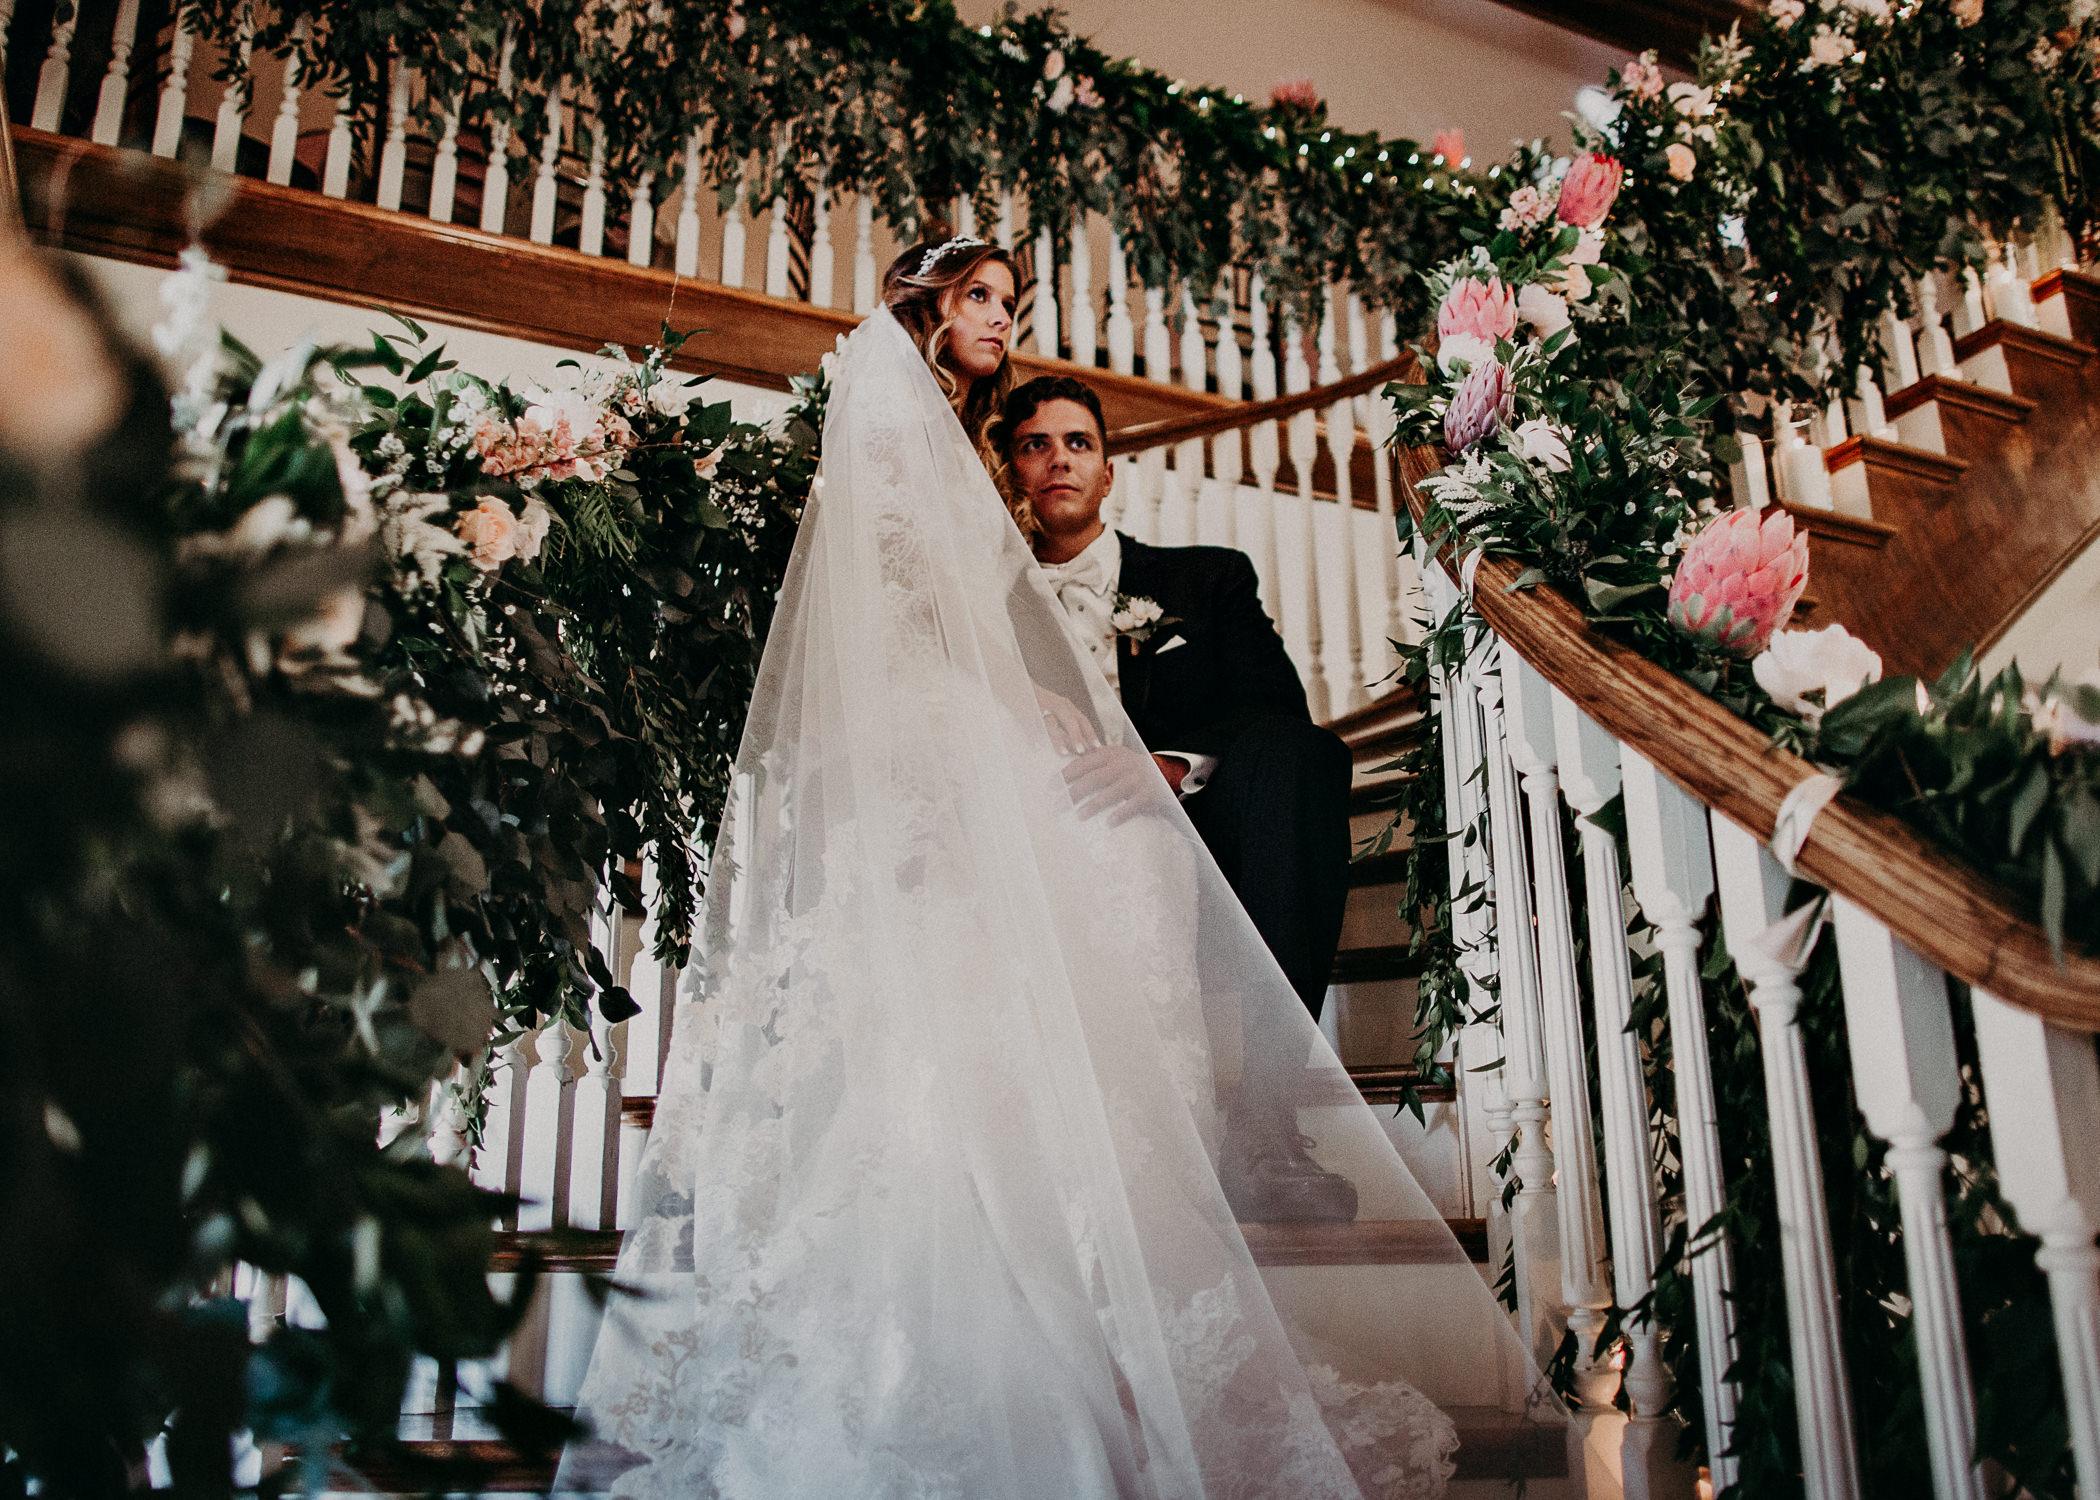 61Carl House Wedding Venue Ga, Atlanta Wedding Photographer - Boho, Bohemian, Junebug Weddings, Vintage, Retro, Trendy. Aline Marin Photography. .jpg